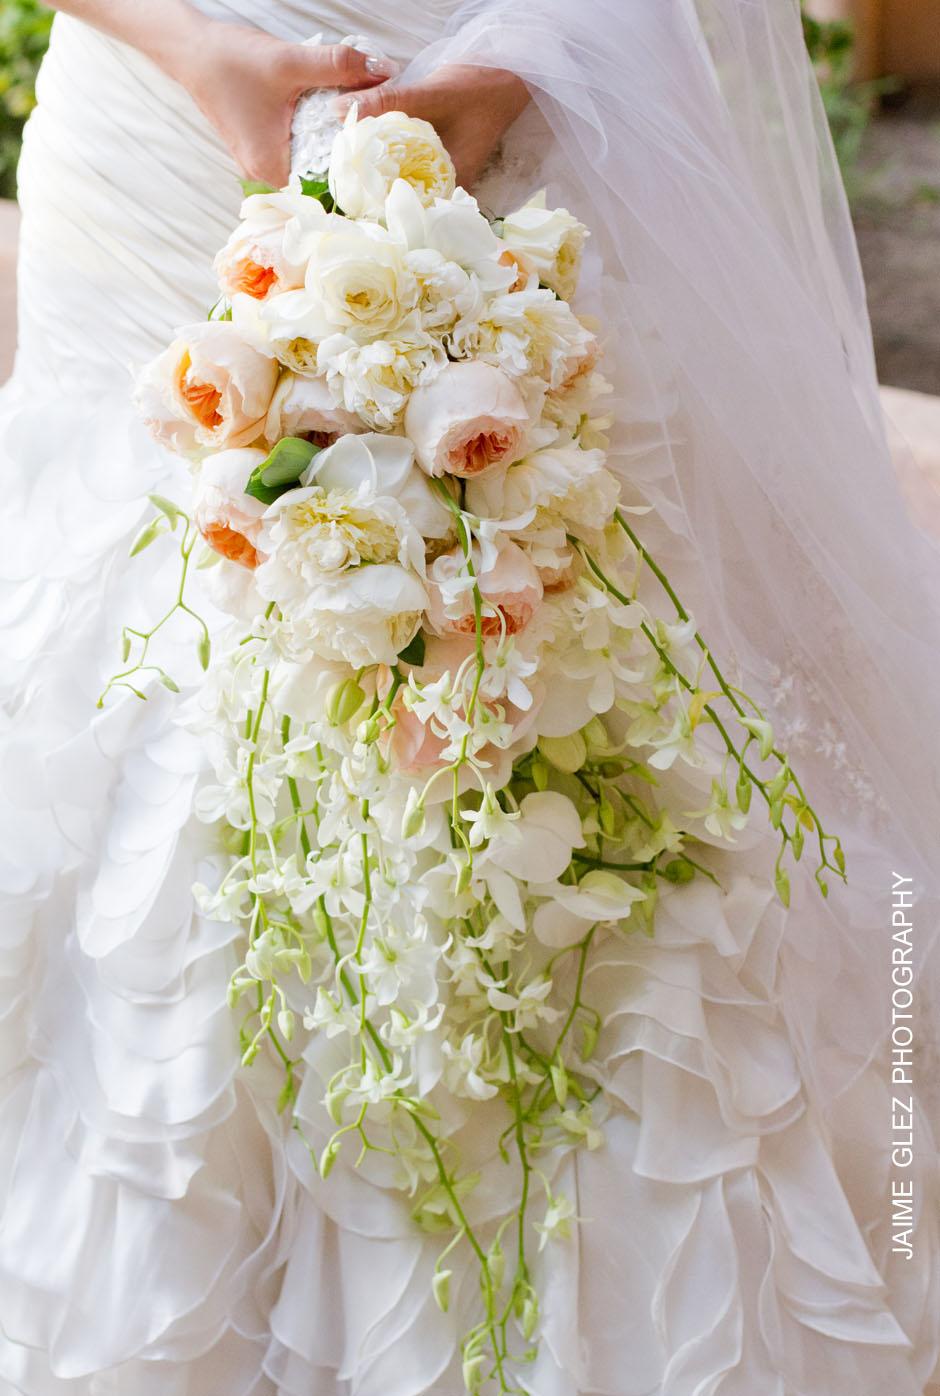 fotografo-de-boda-ciudad-del-carmen-campeche-7